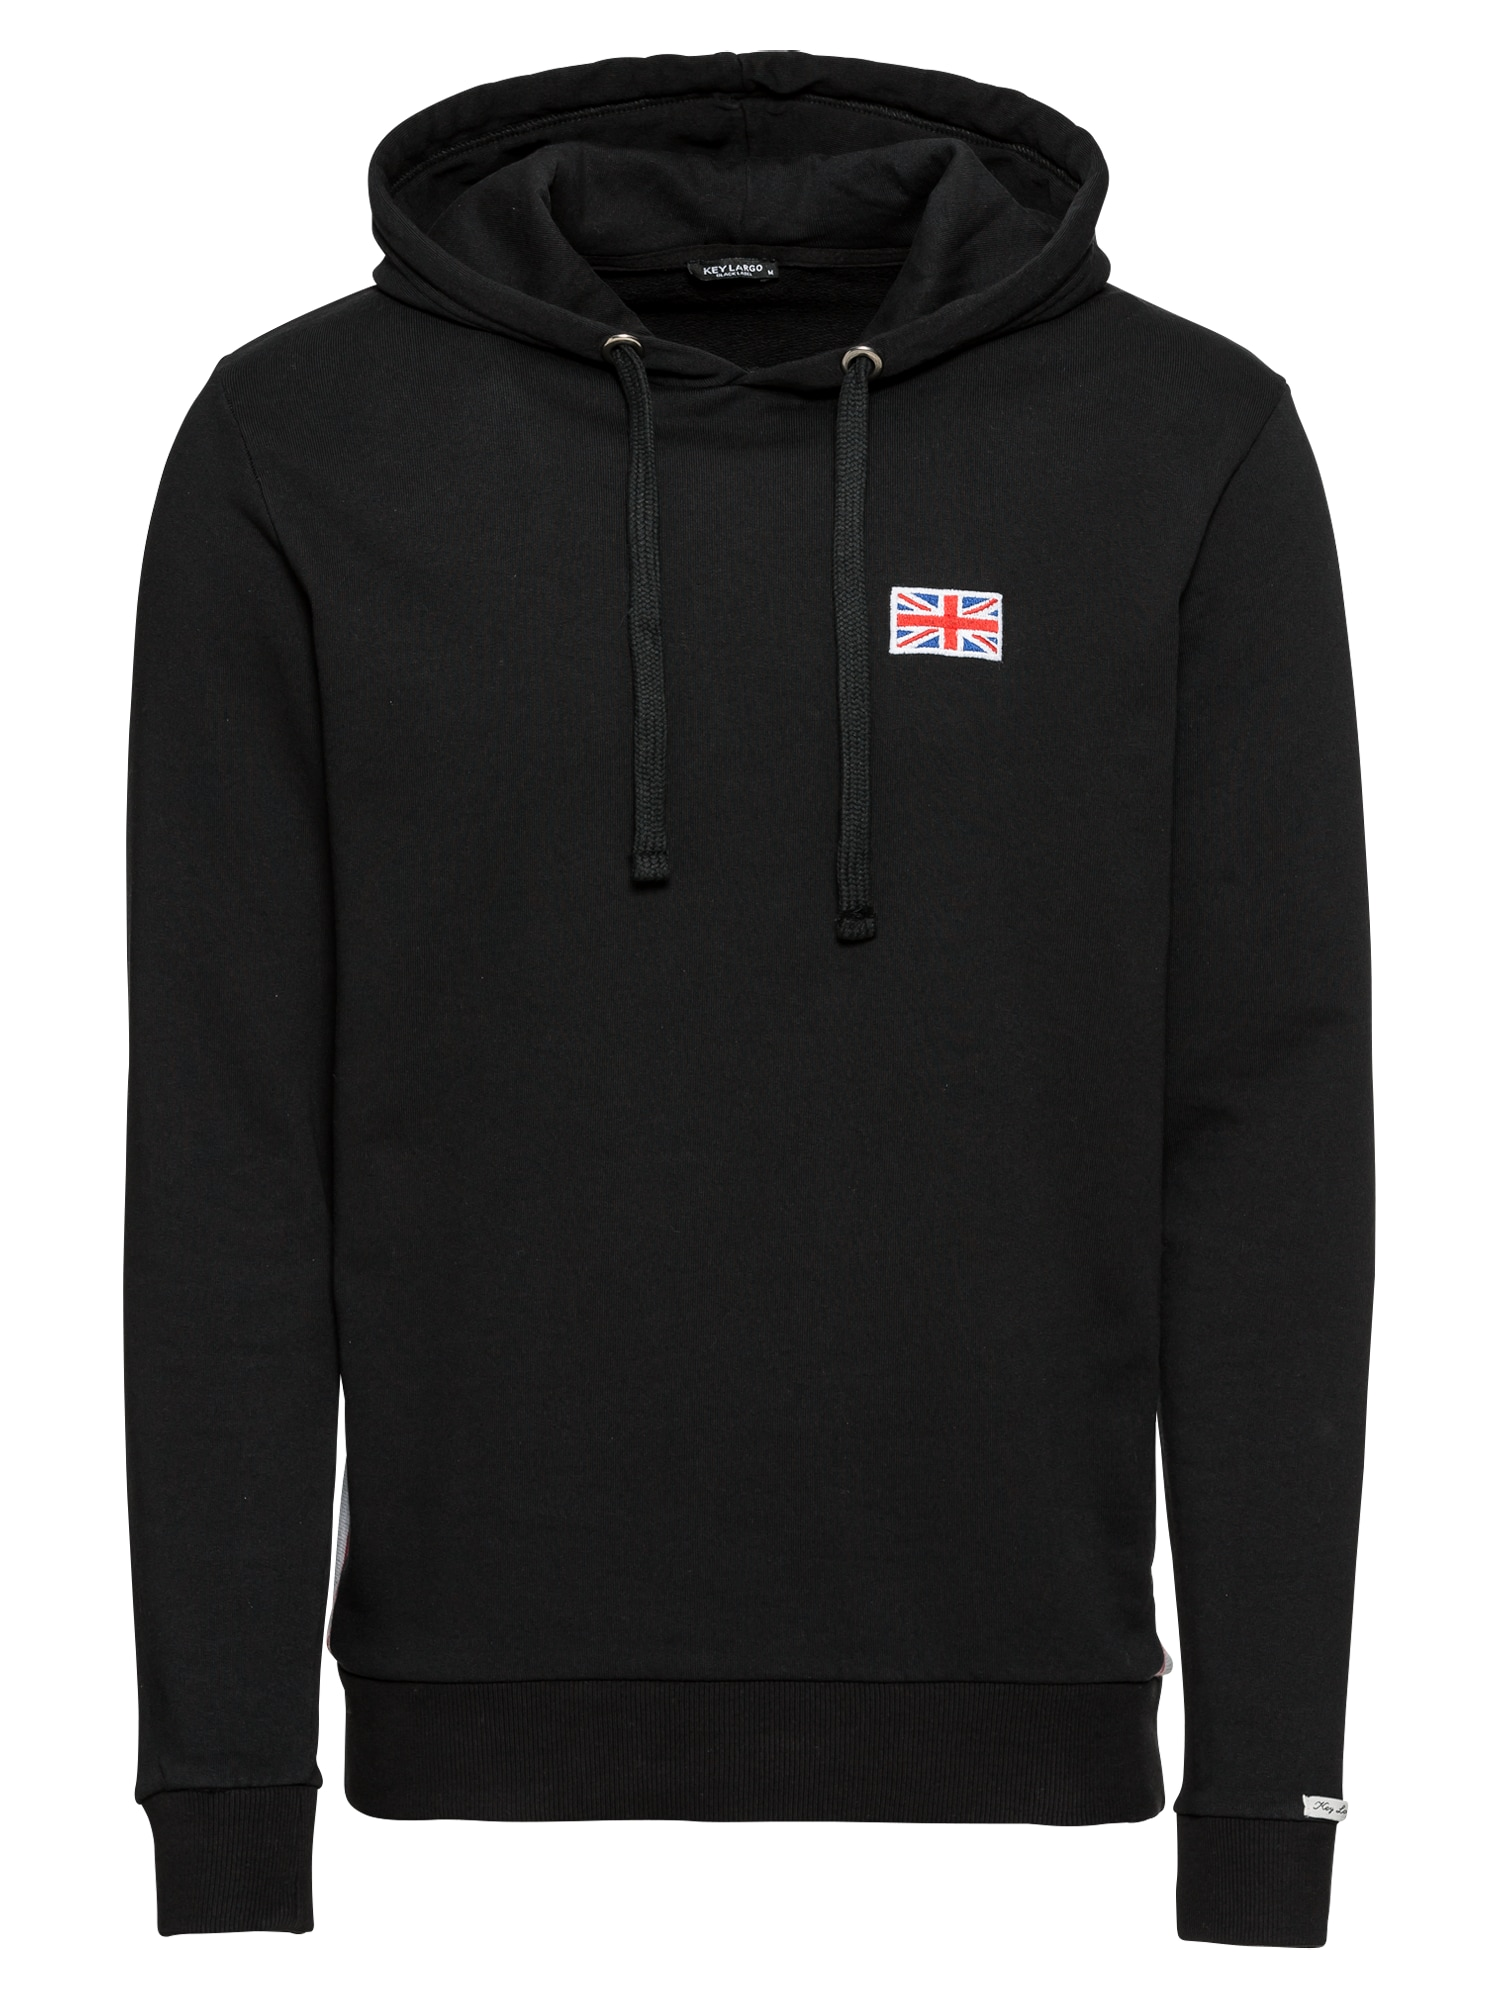 Hoodie 'MSW LONDON hoody' | Bekleidung > Pullover > Kapuzenpullover | Schwarz | Key Largo